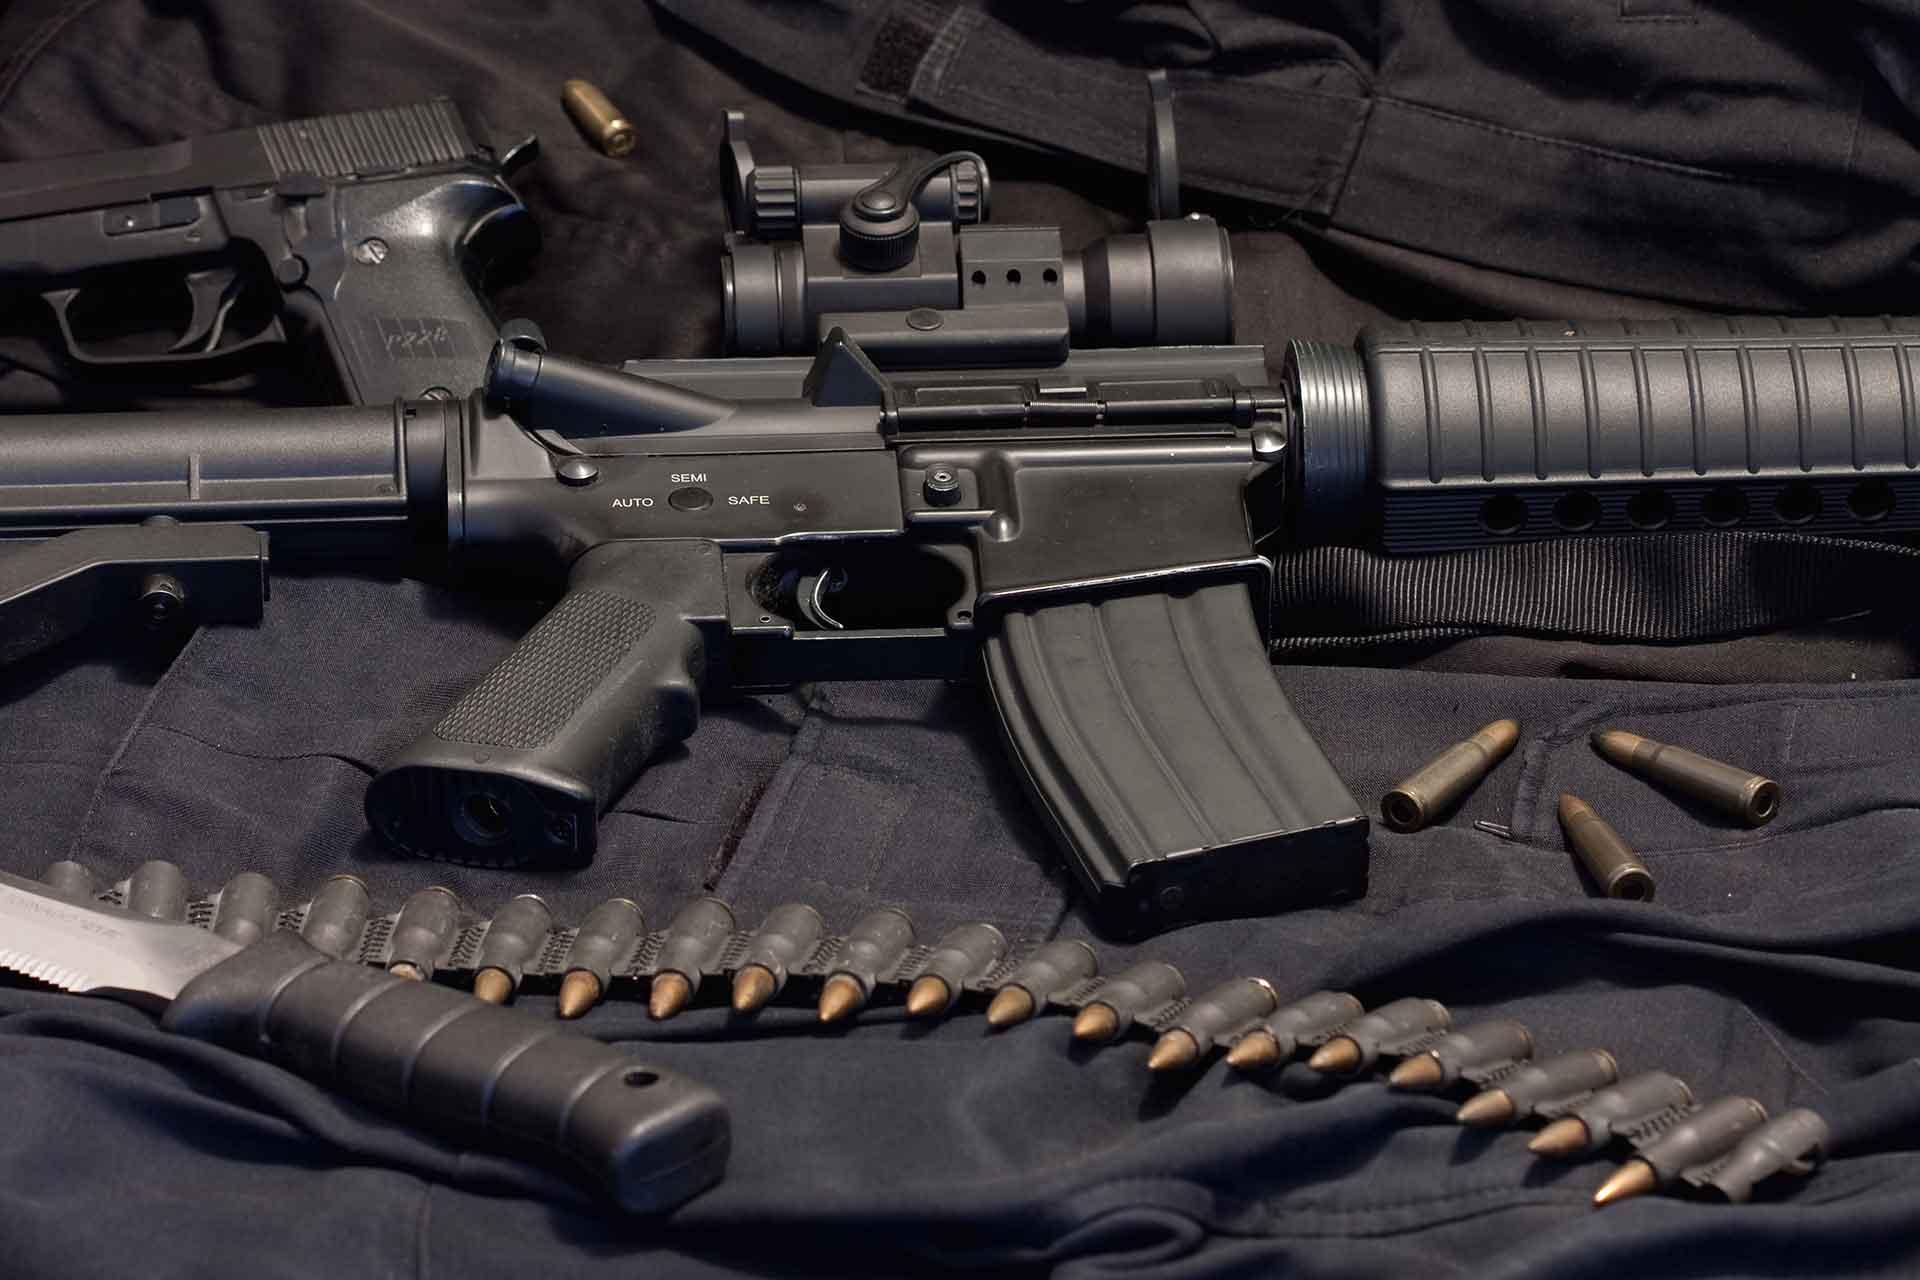 Wapens en munitie strafrecht advocaat - Weening Strafrechtadvocaten